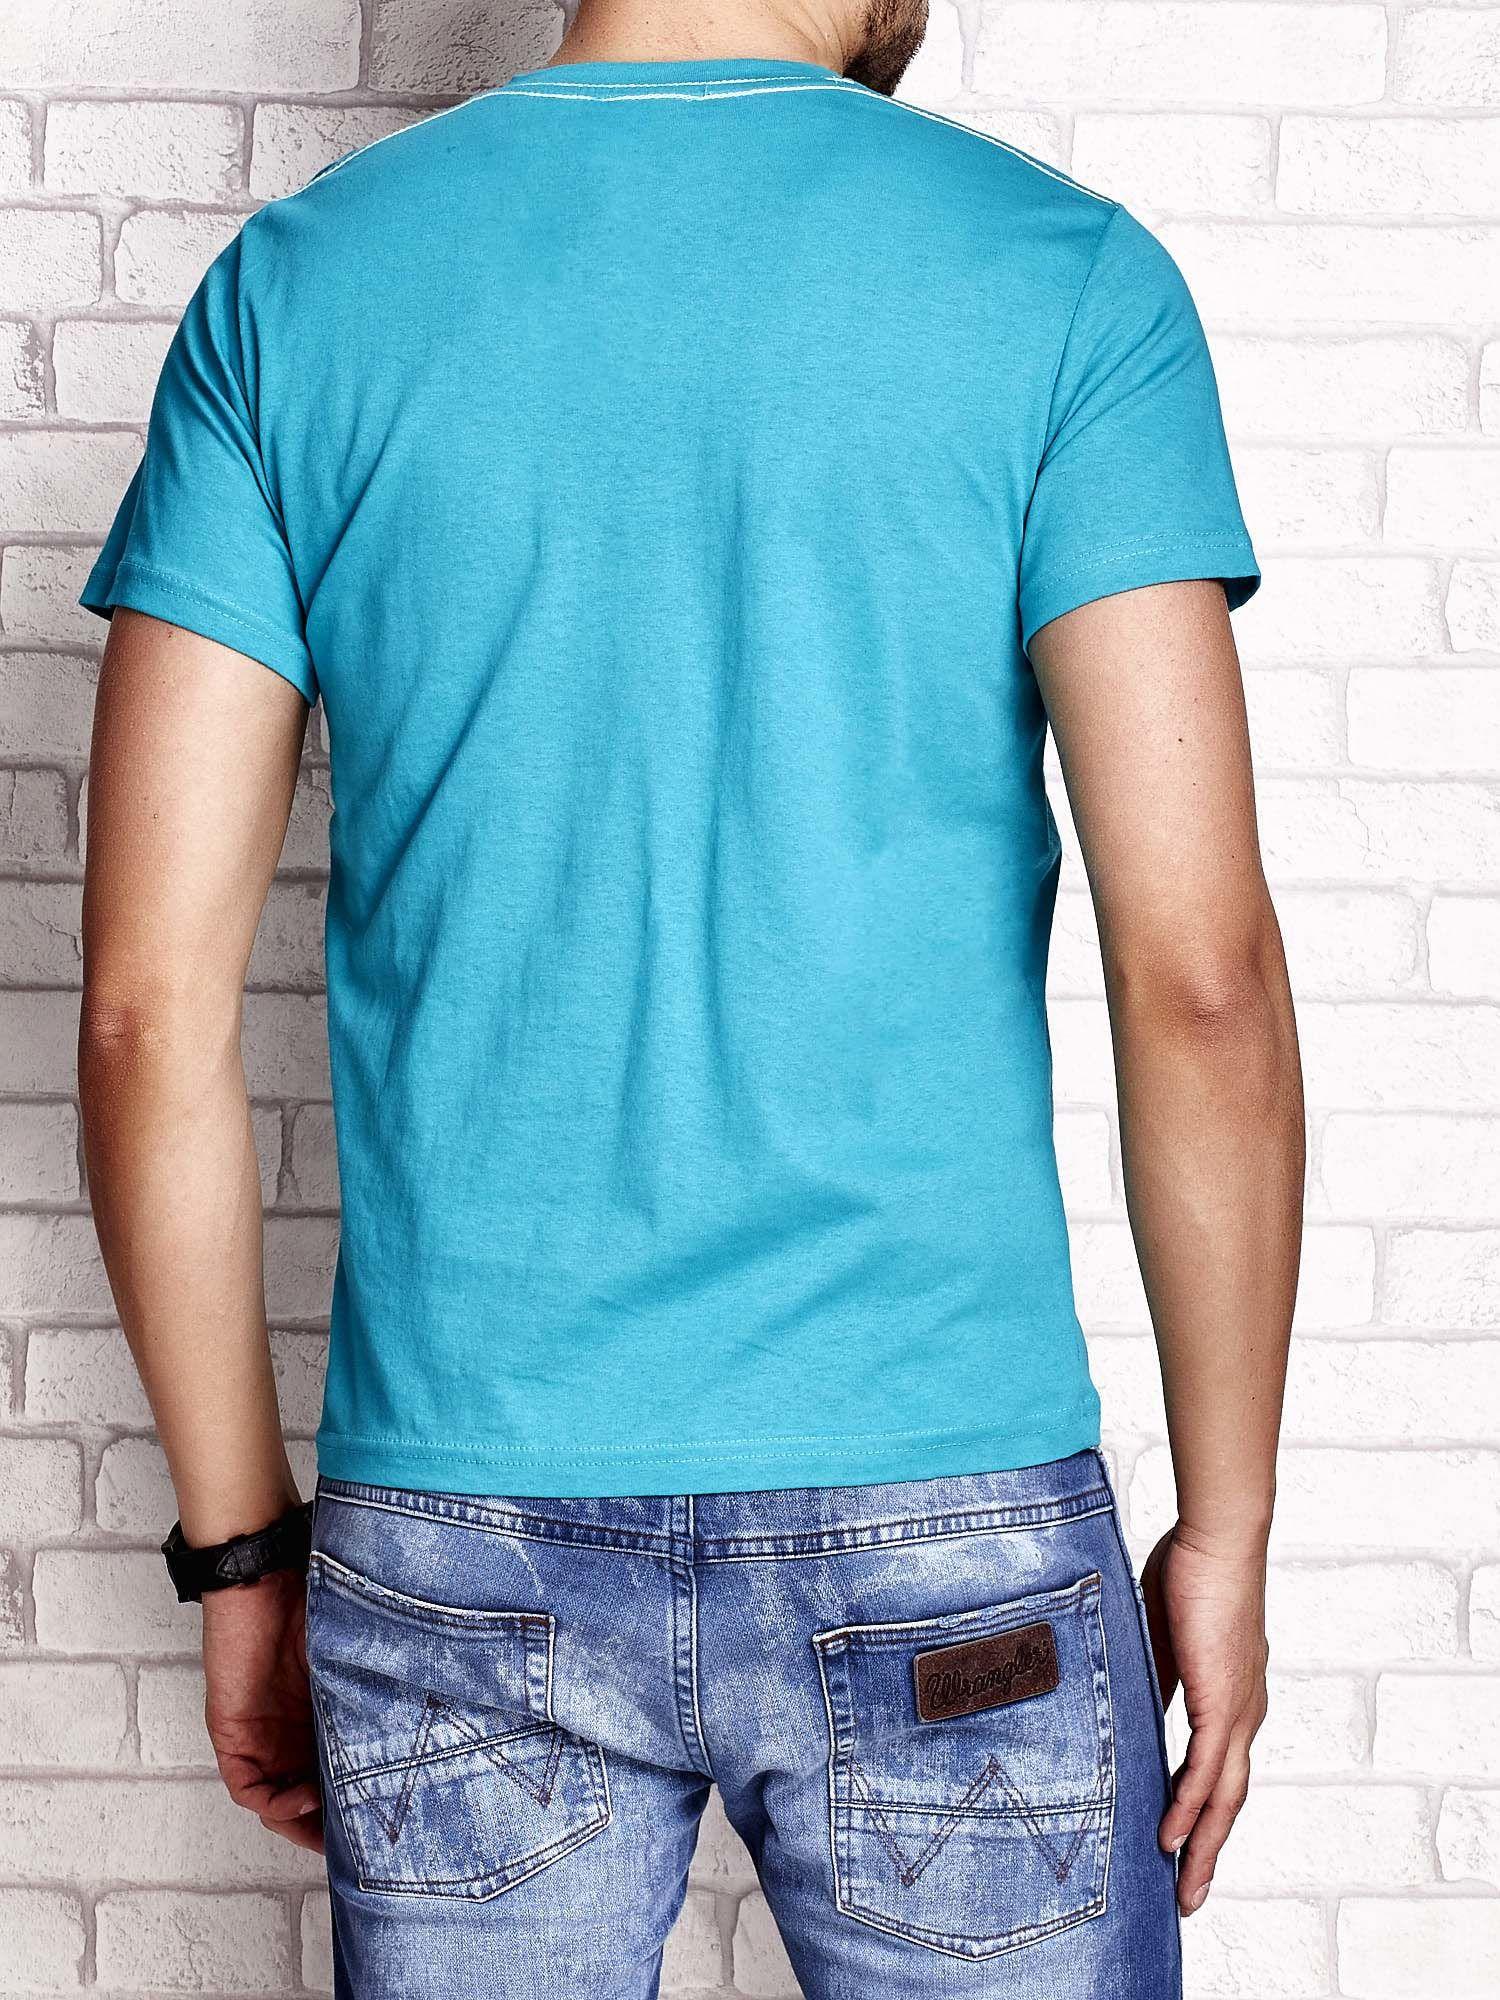 Zielony t-shirt męski z napisem BROOKLYN ATHLETIC UNIVERSITY                                  zdj.                                  2